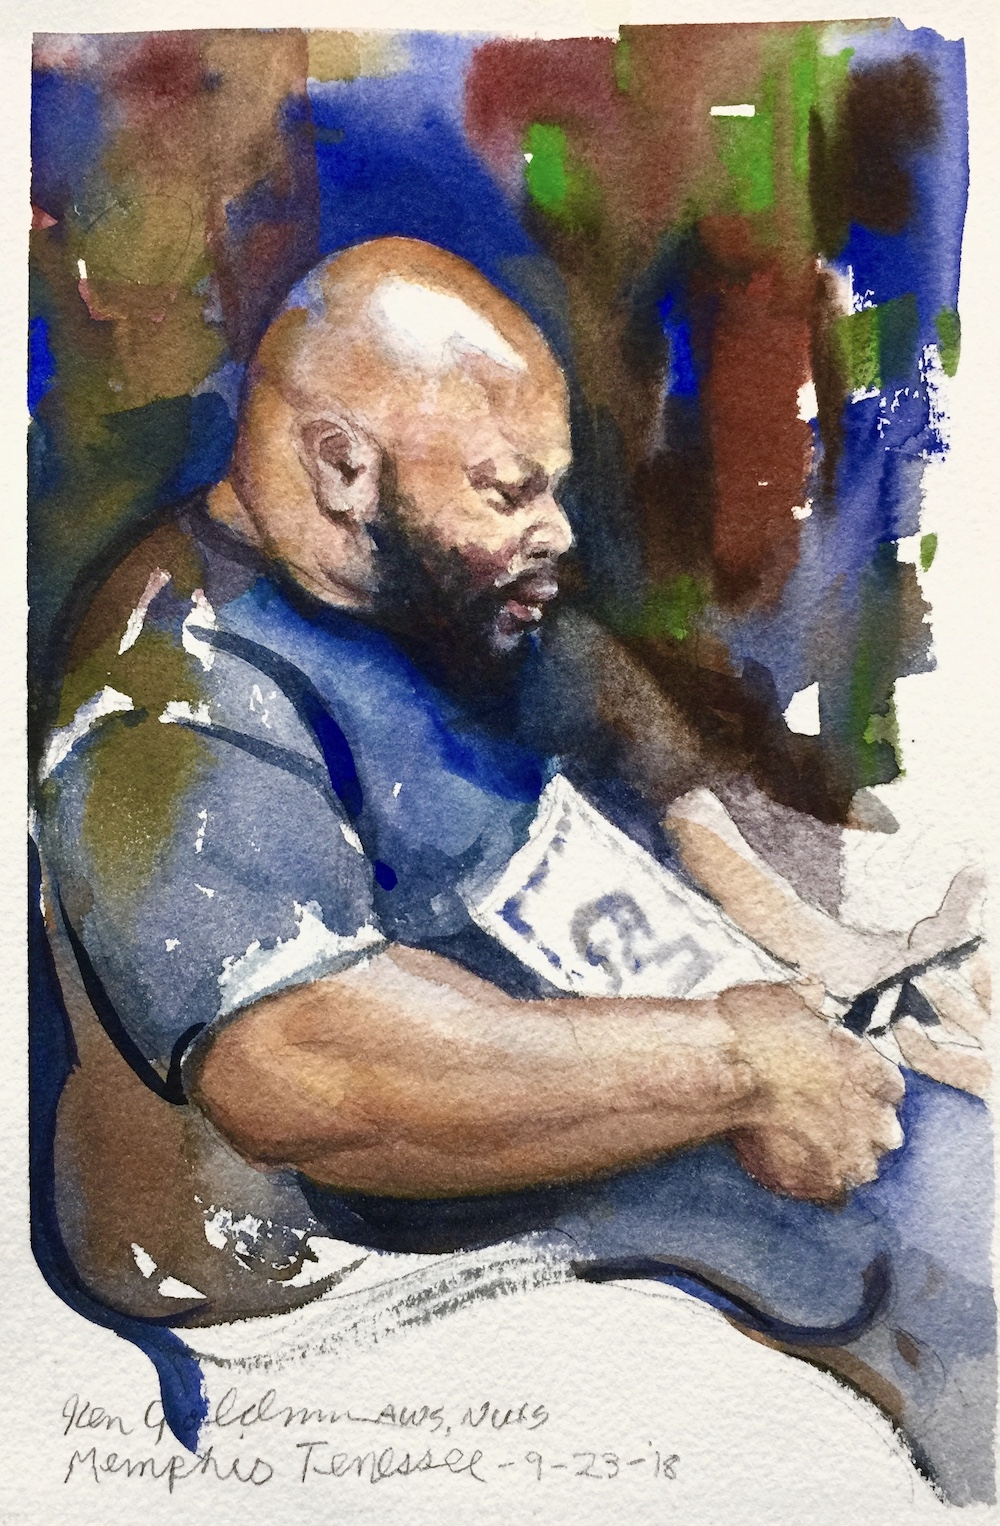 Ken Goldmanfineart_Memphis Bookie_Watercolor_12x9